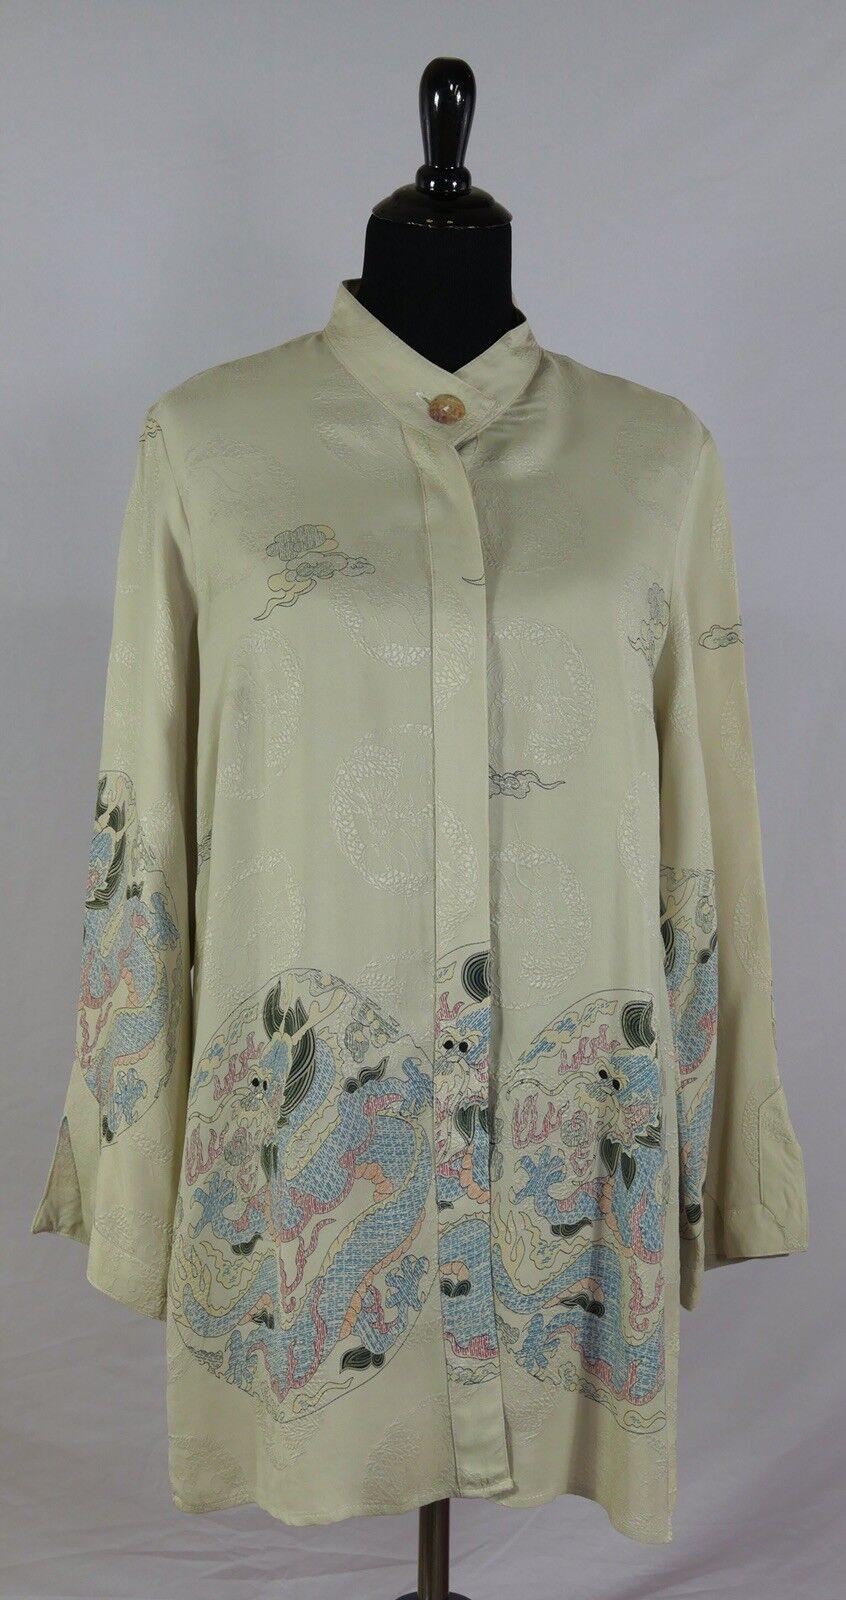 Citron Santa Monica Oriental Japanese Asian Dragons Blouse Jacket Duster Silk M